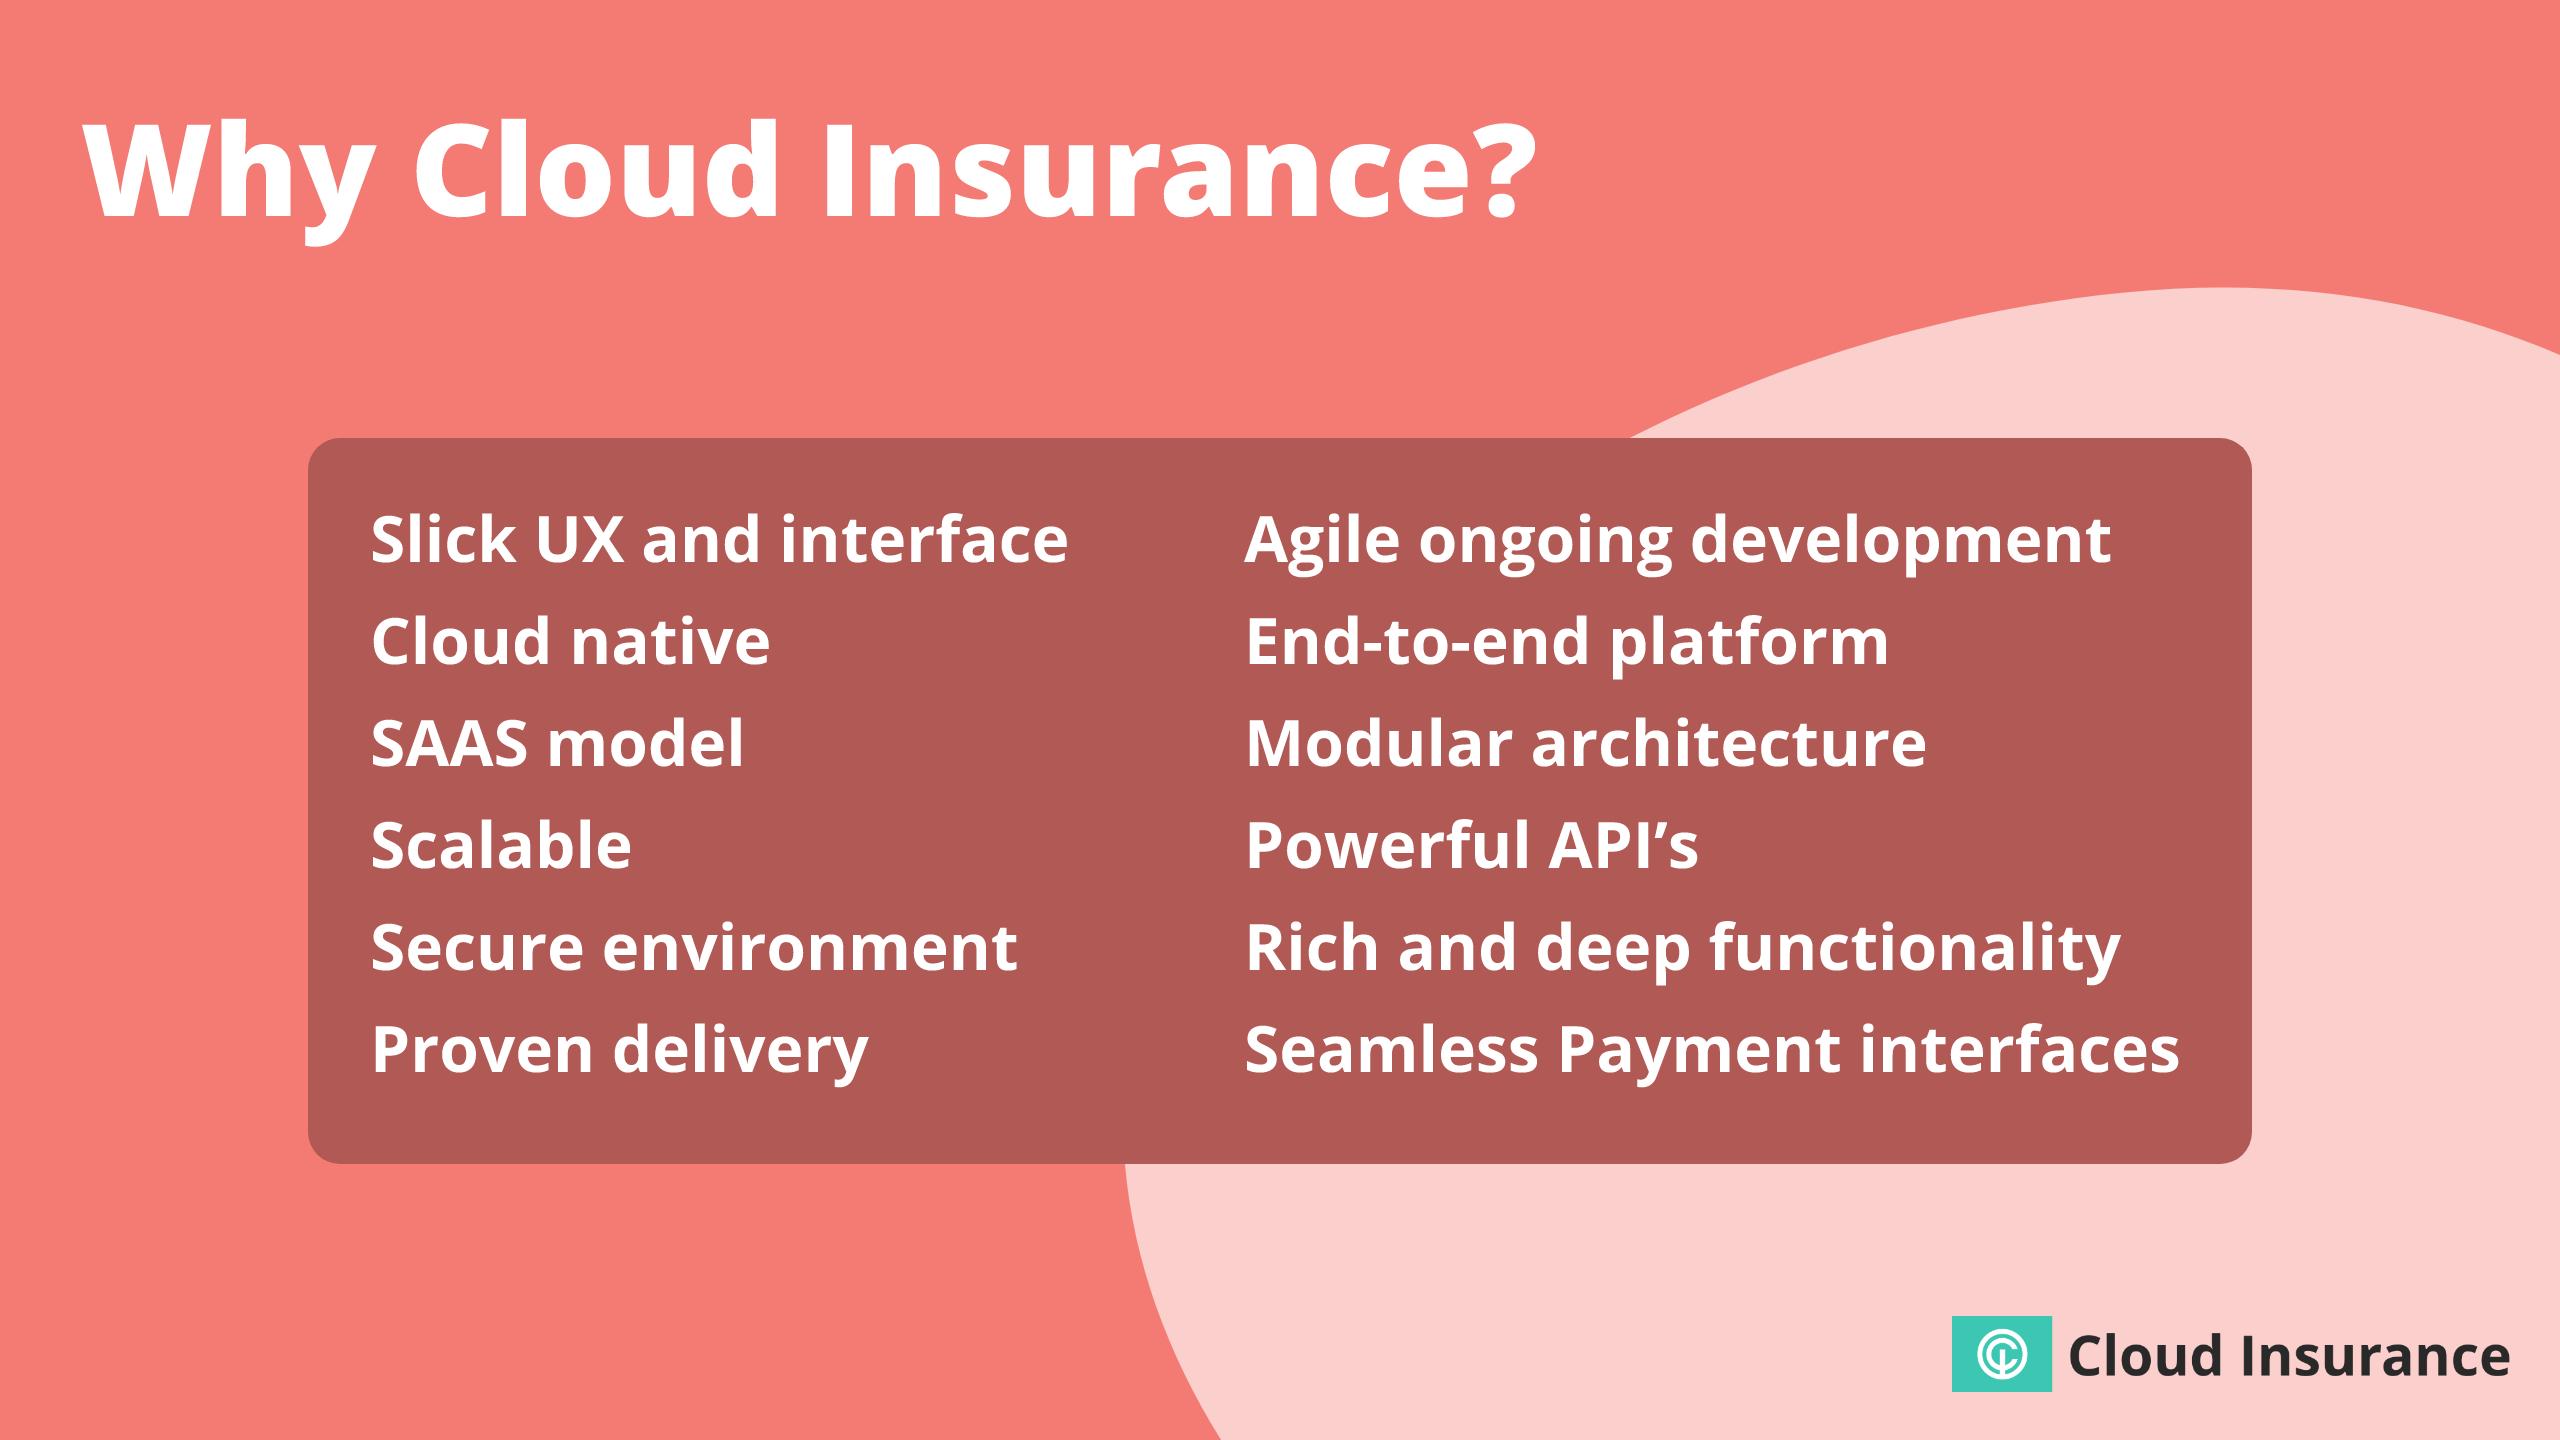 Advantages of the CloudInsurance platform.